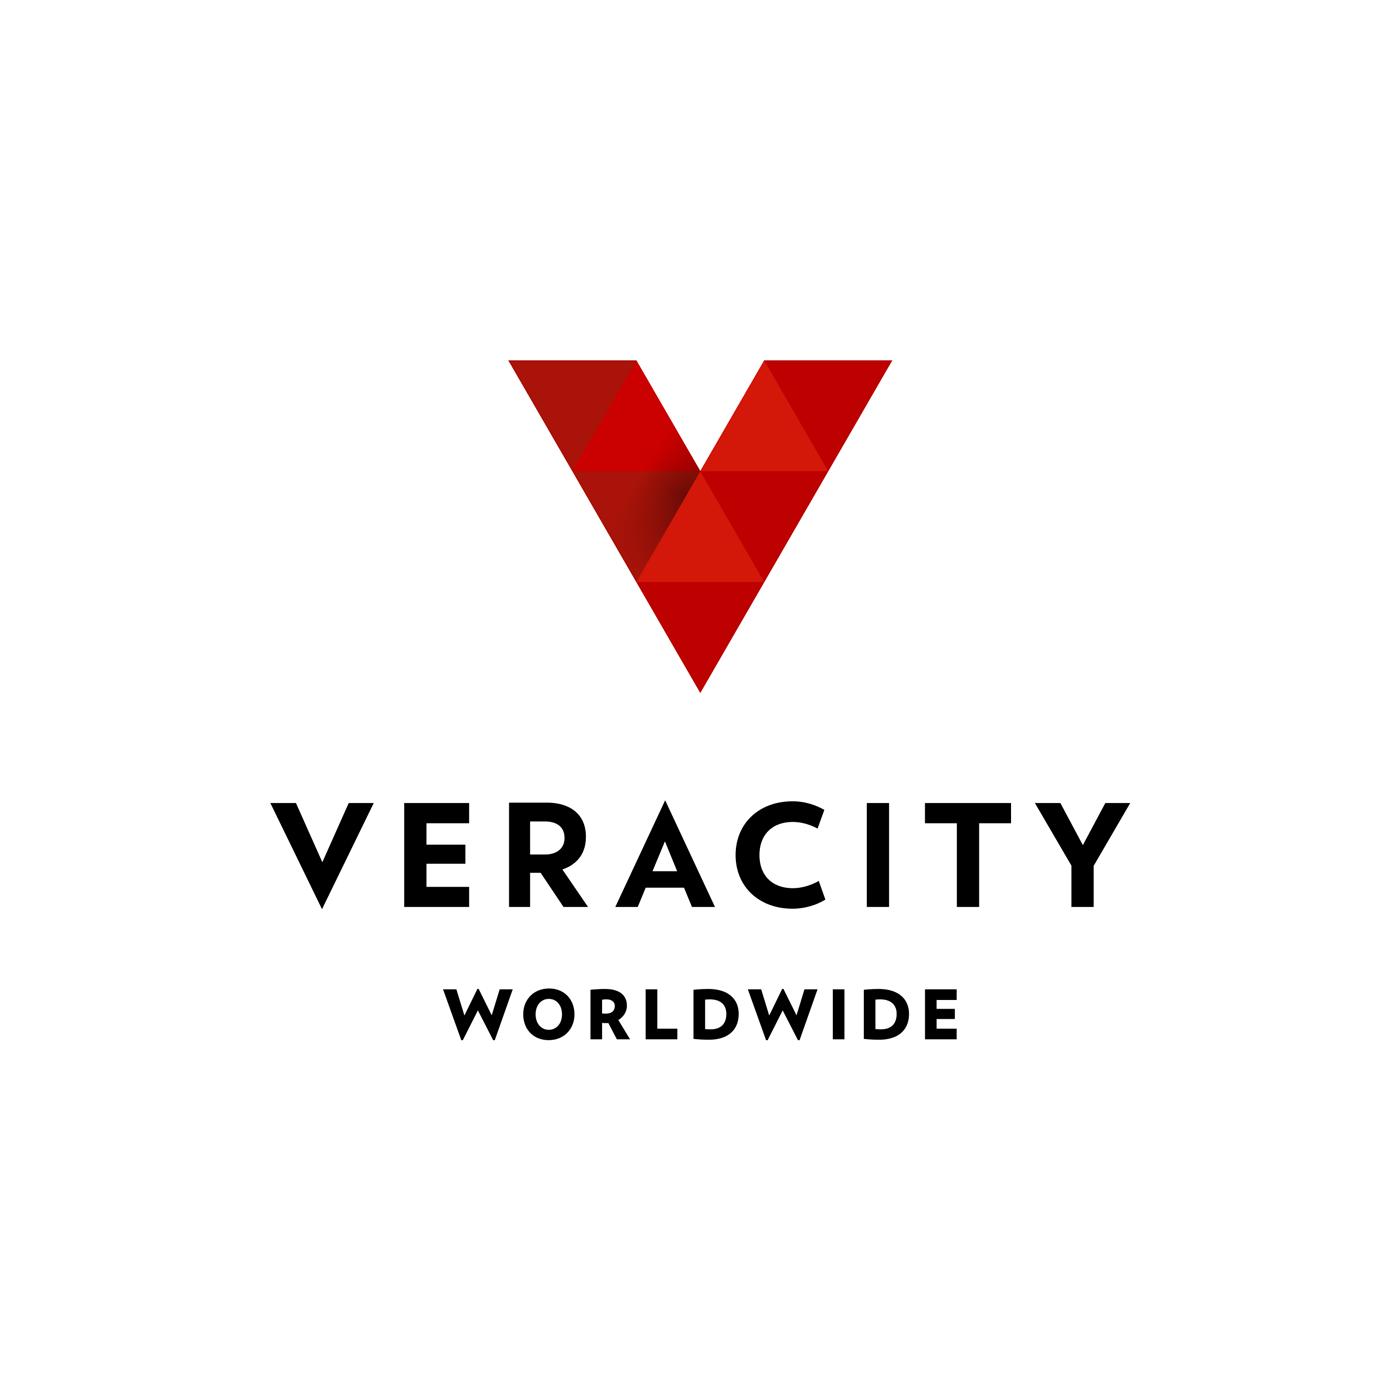 VW Lockup Worldwide RGB 1 - Veracity Worldwide